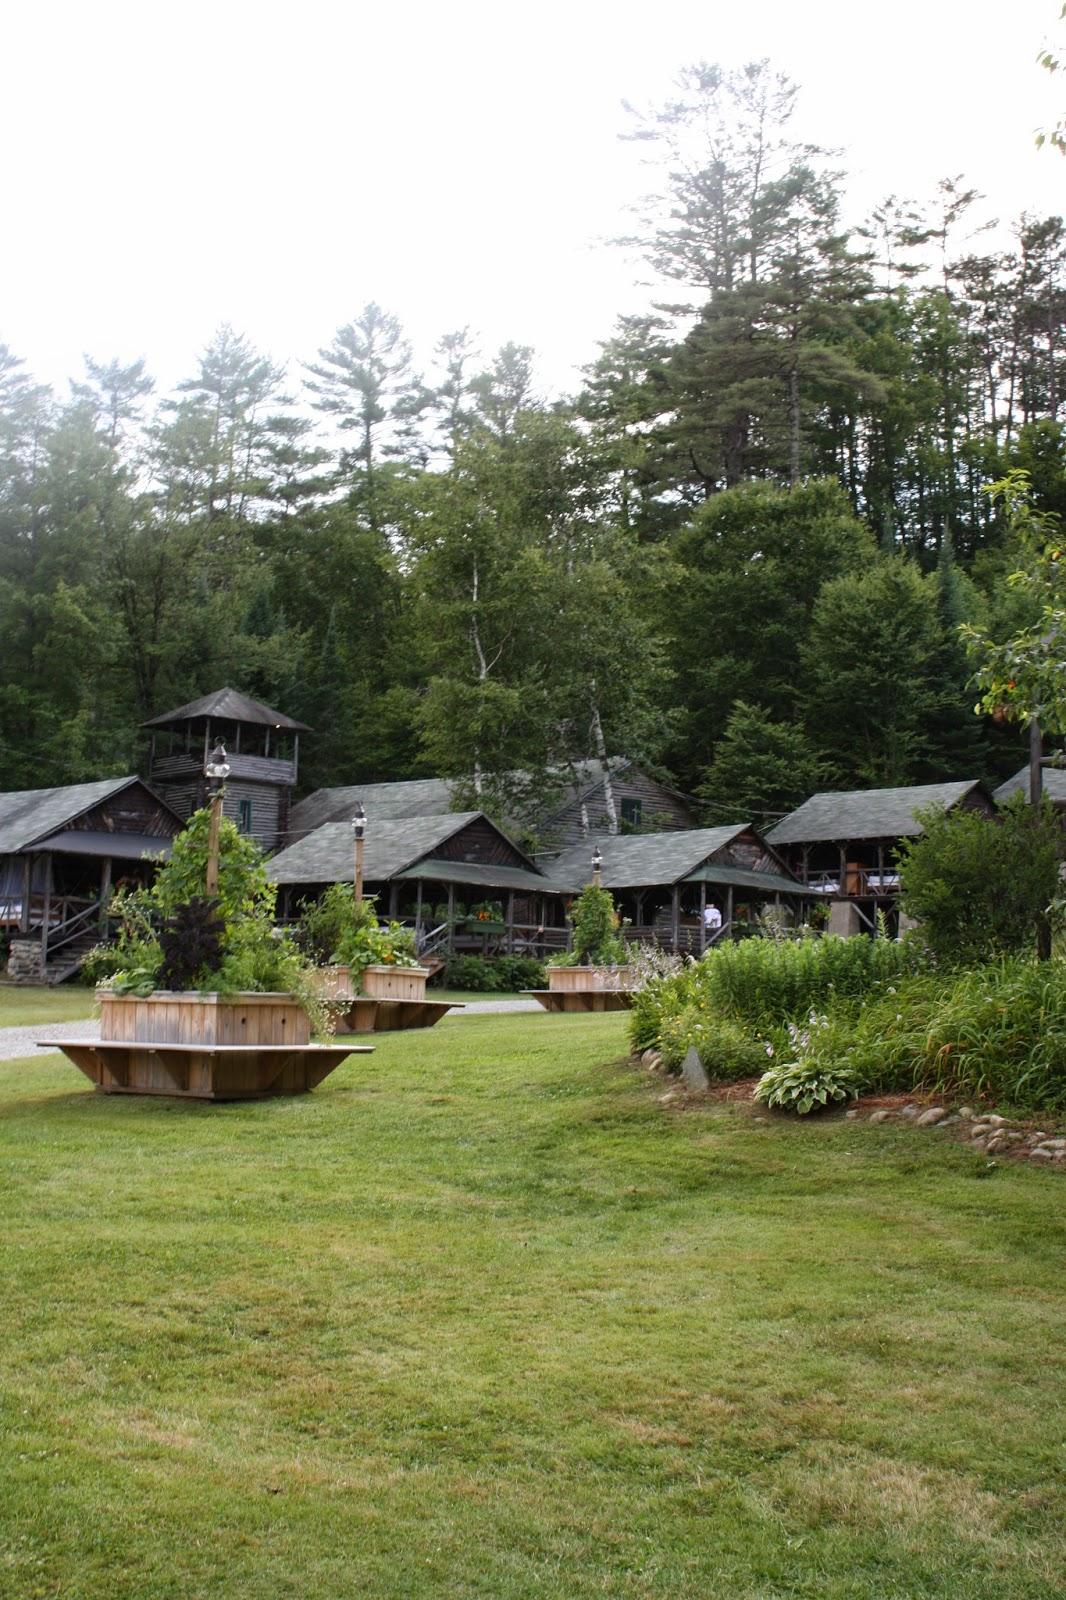 camp ogontz rehearsal hall cabins